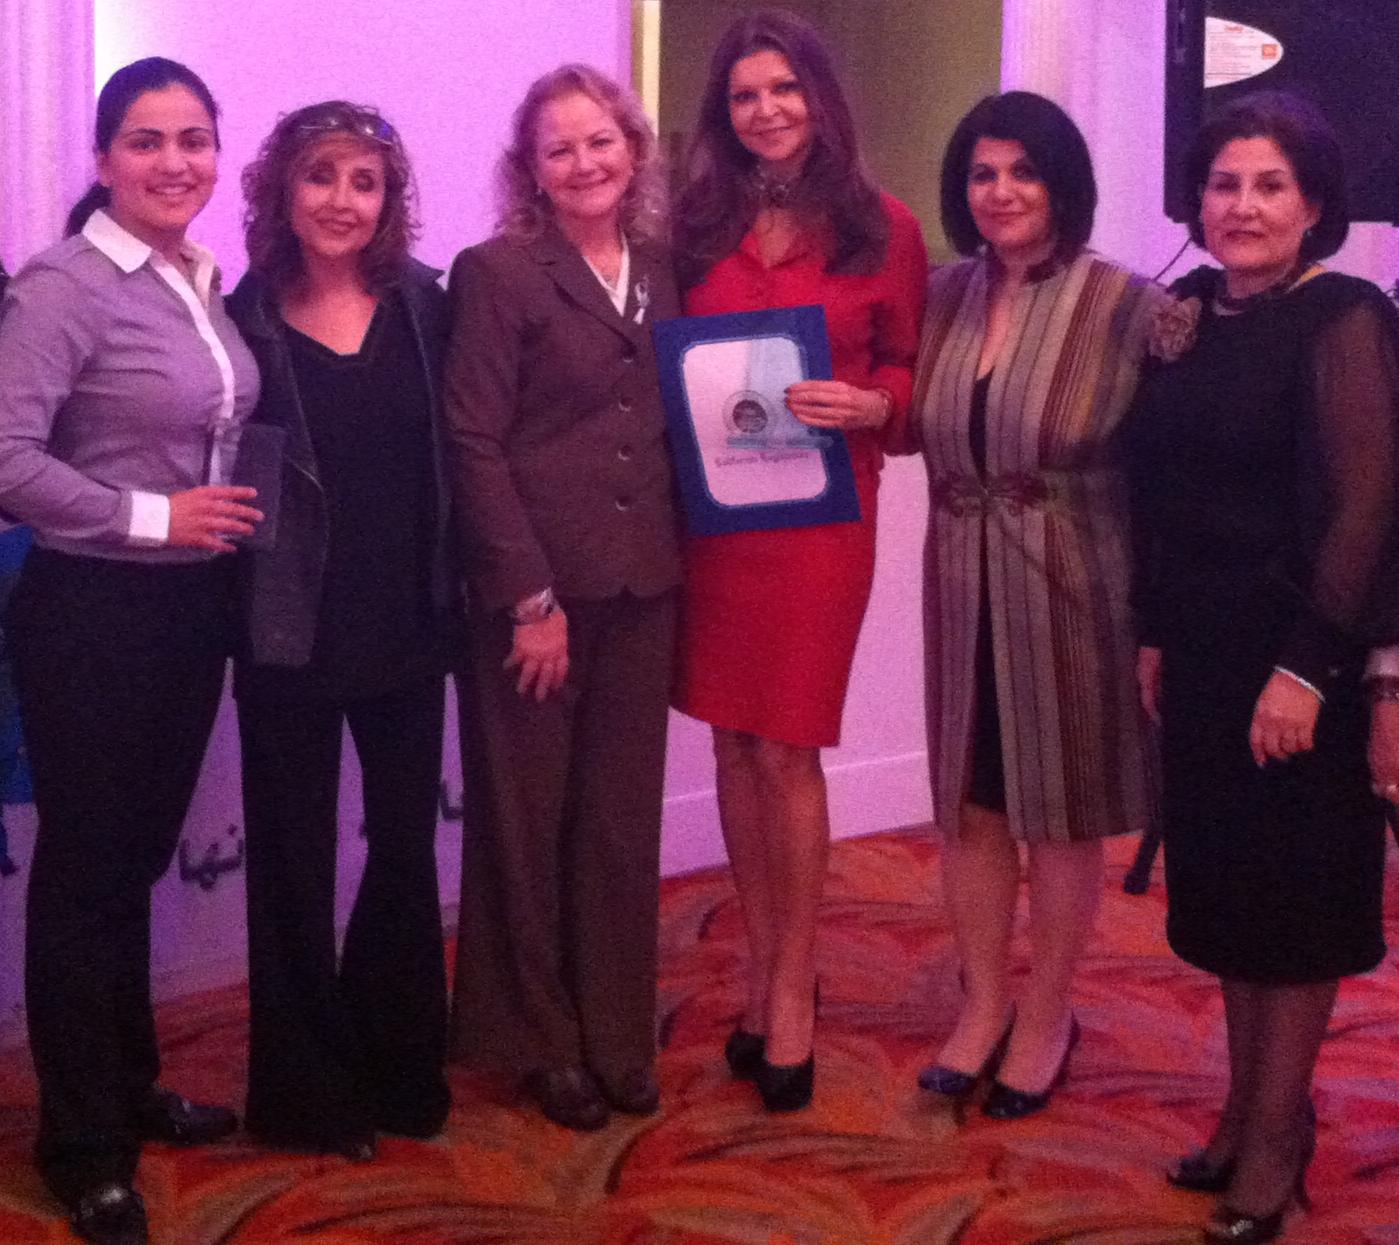 Aisha Wahab, Salma Schemp, Nancy O'Malley, Sonia N Cole, Nazema Momand, Rona Popal.jpg